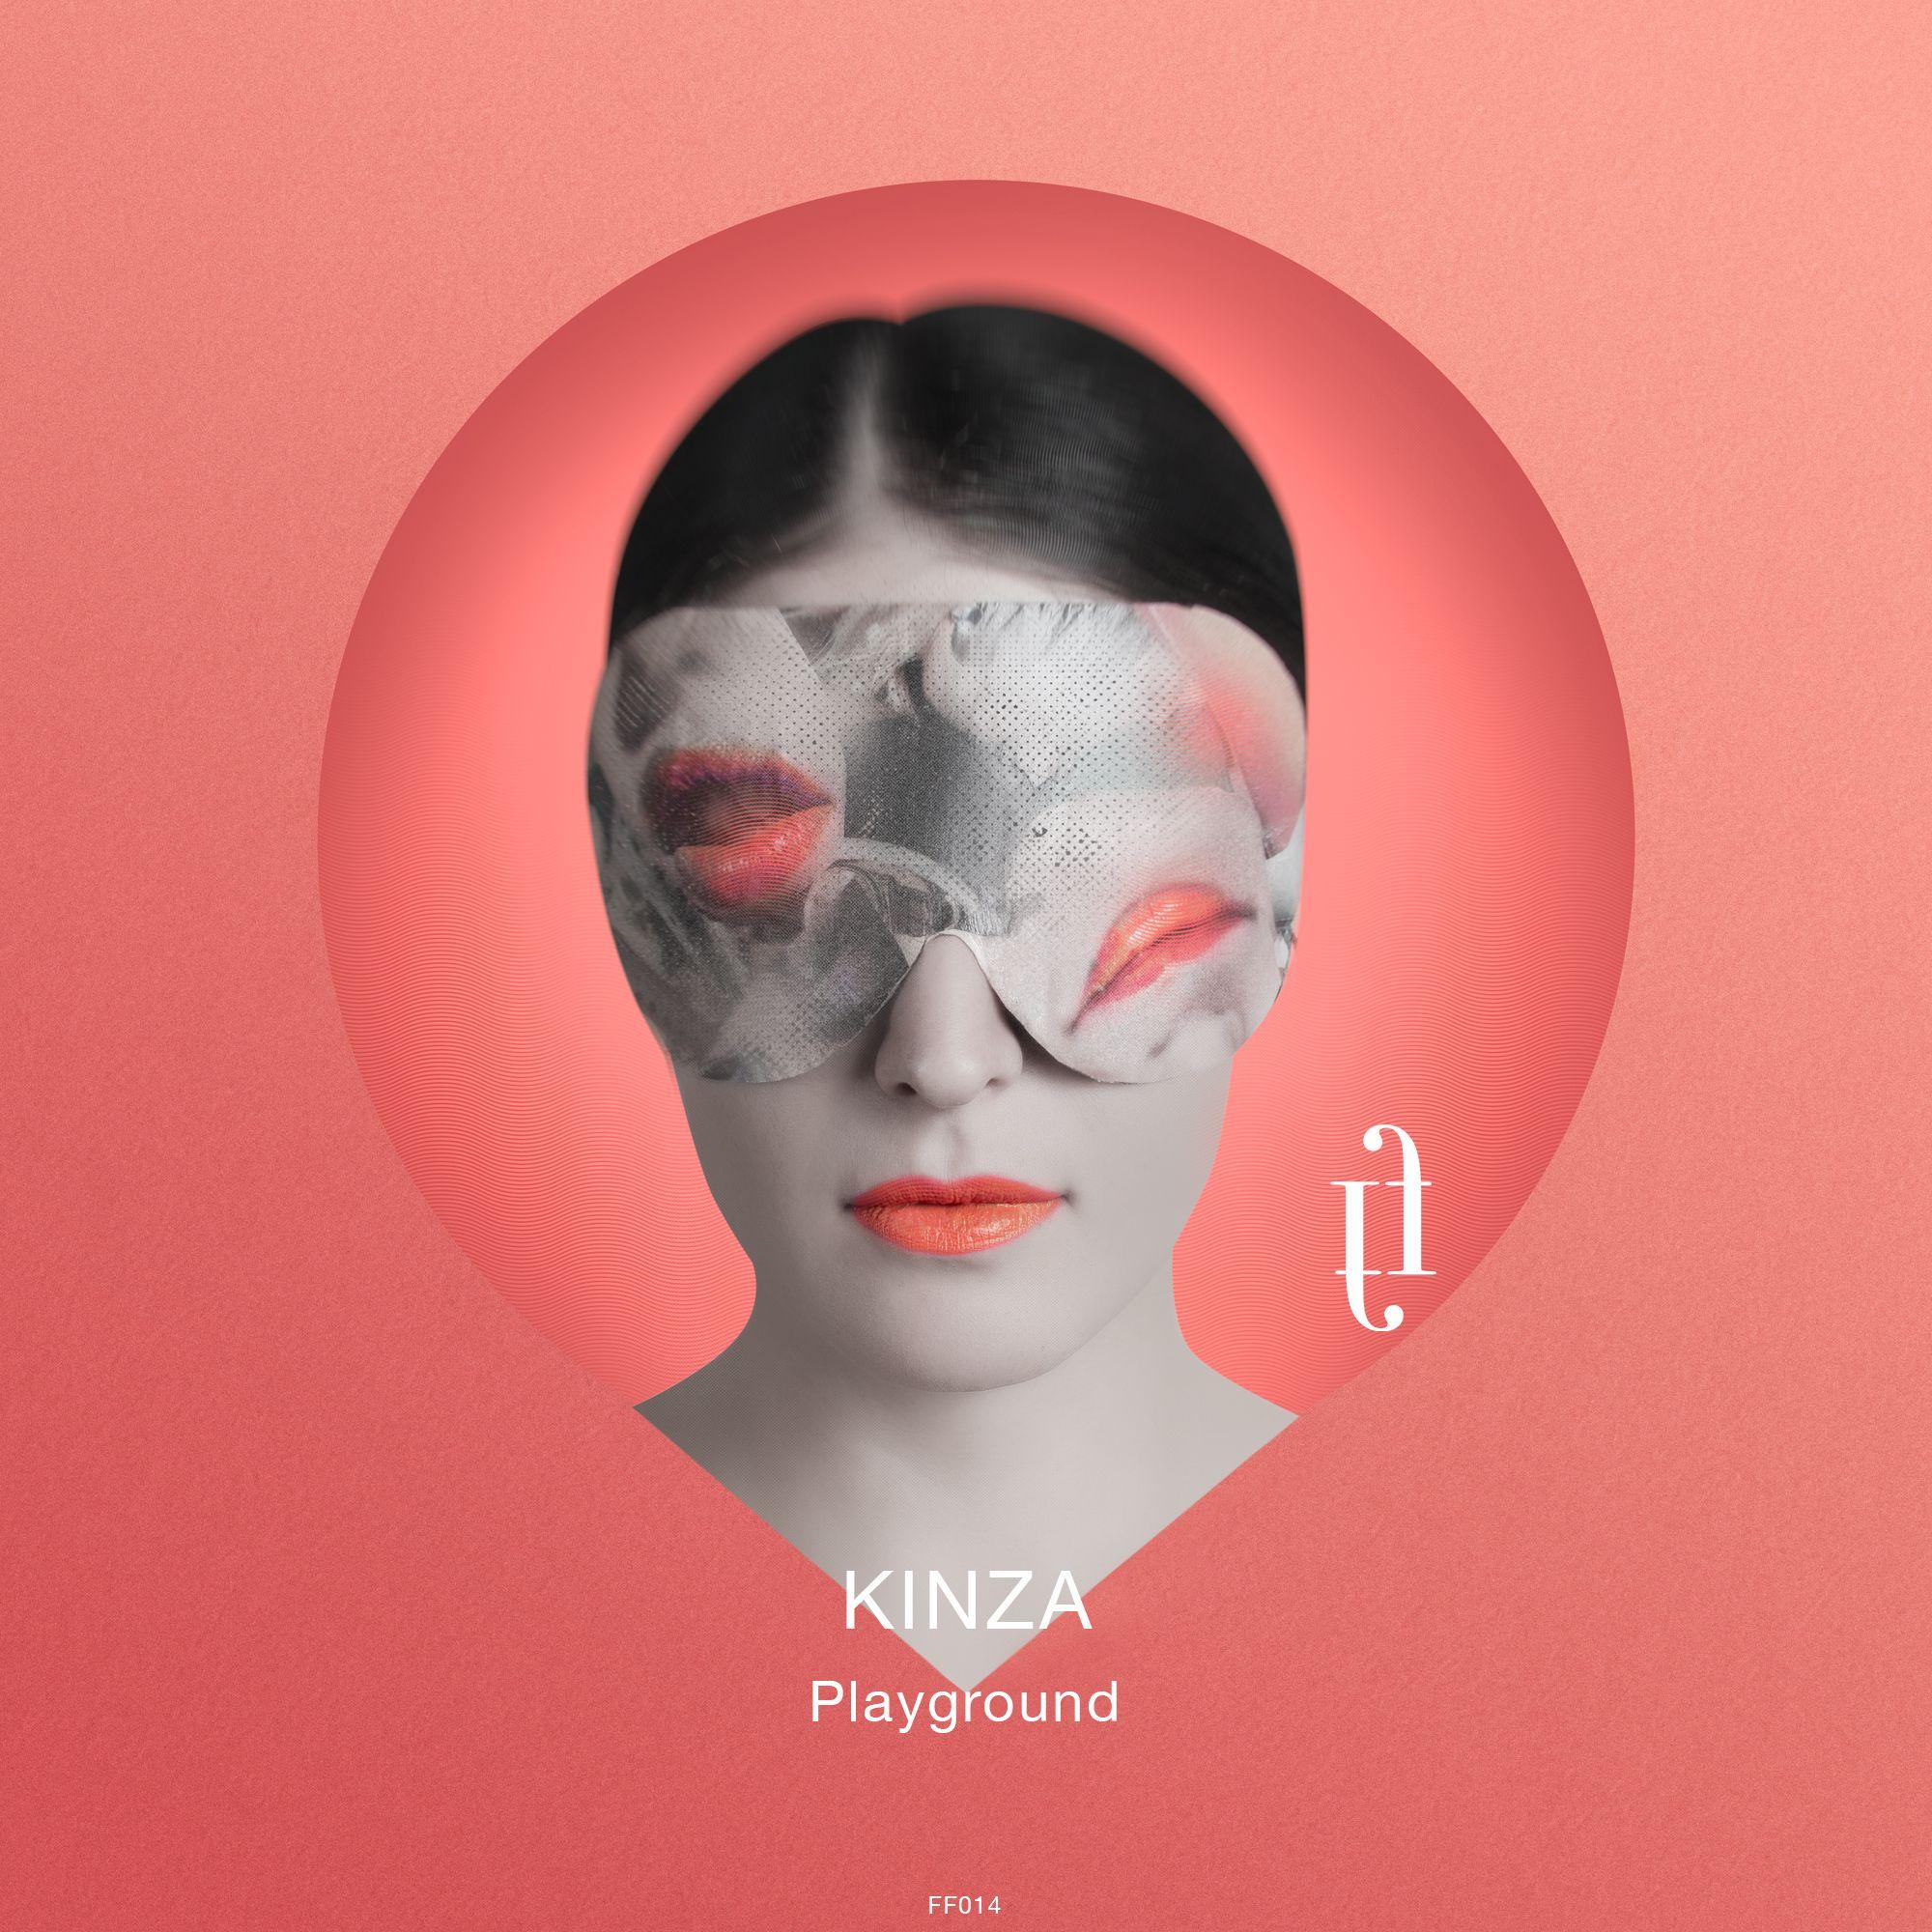 ff014_kinza_-_playground_lp_coverart.jpg